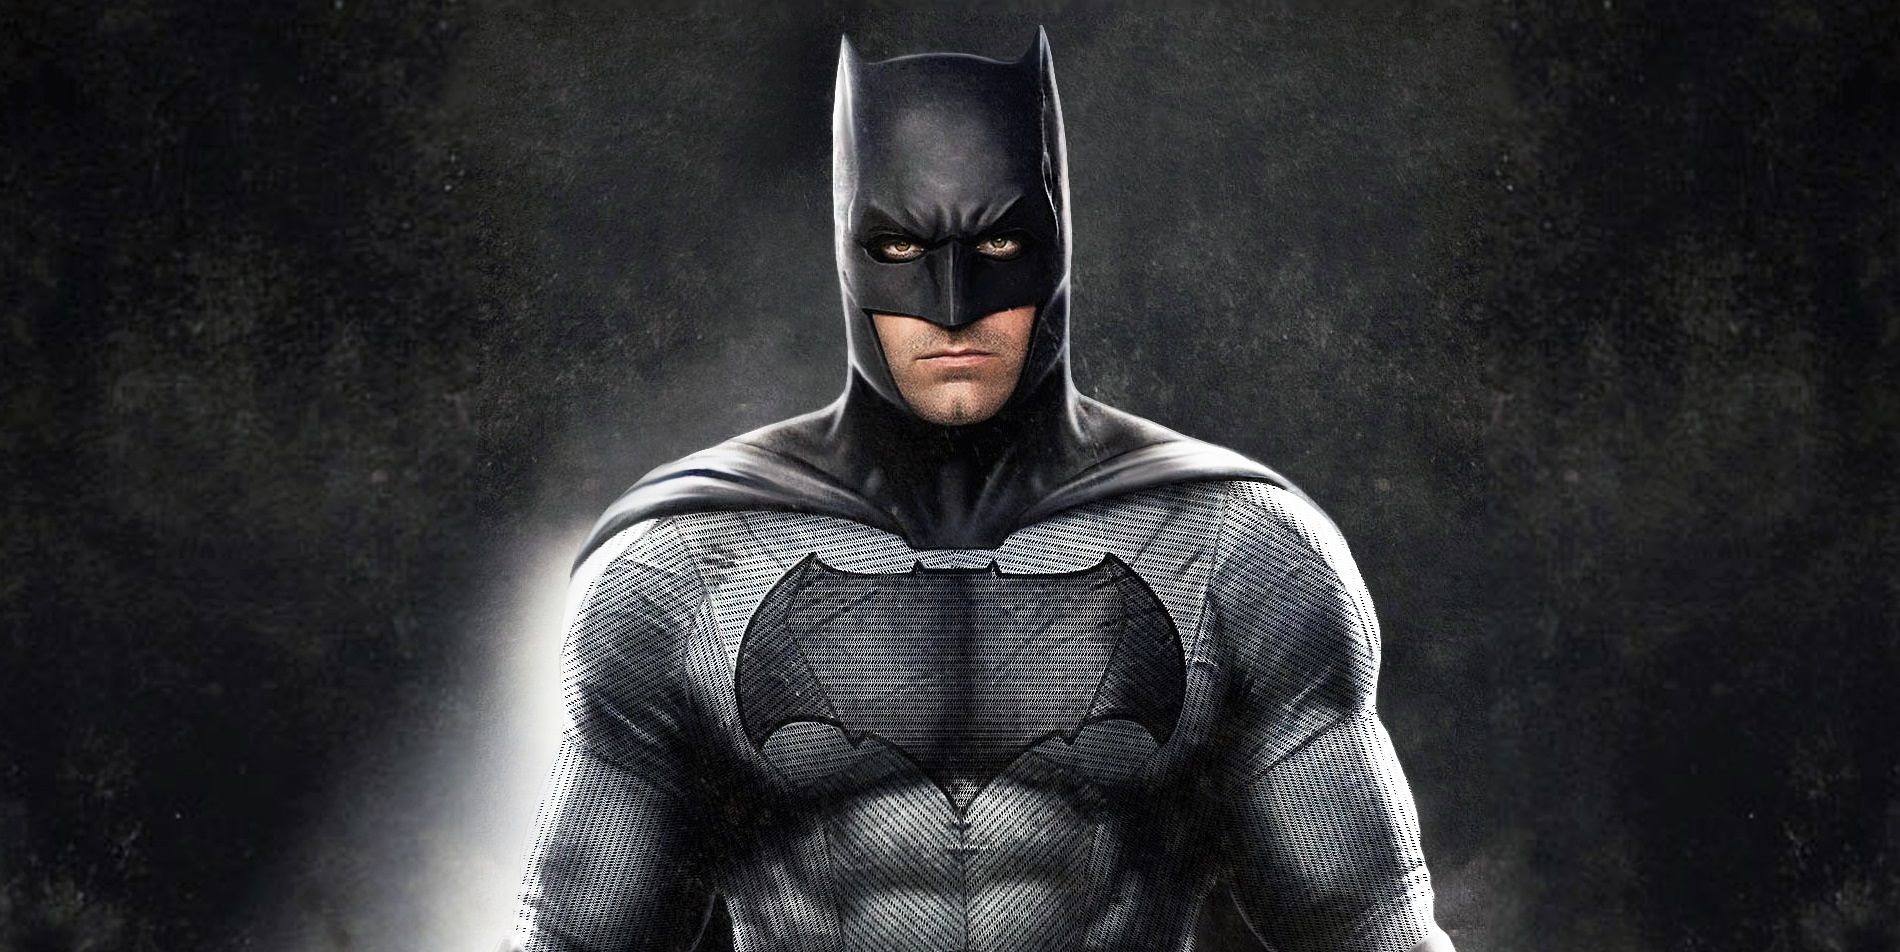 Ben Affleck No Longer Directing Upcoming Batman Movie